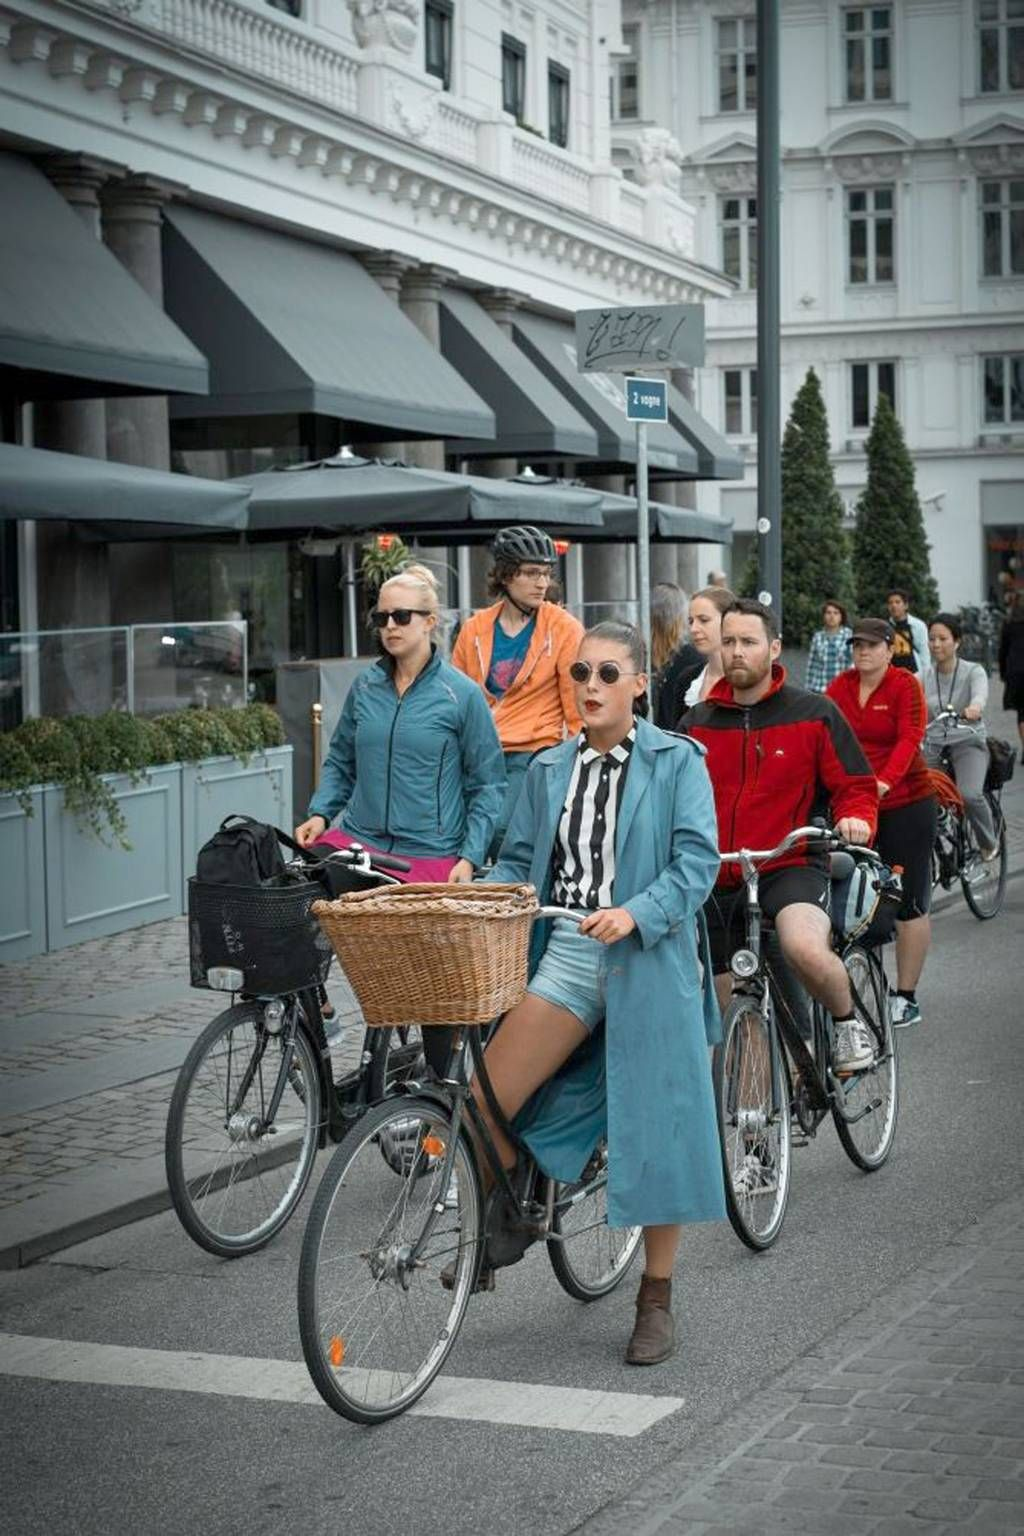 1. Copenhagen, Denmark - greenest city in Europe